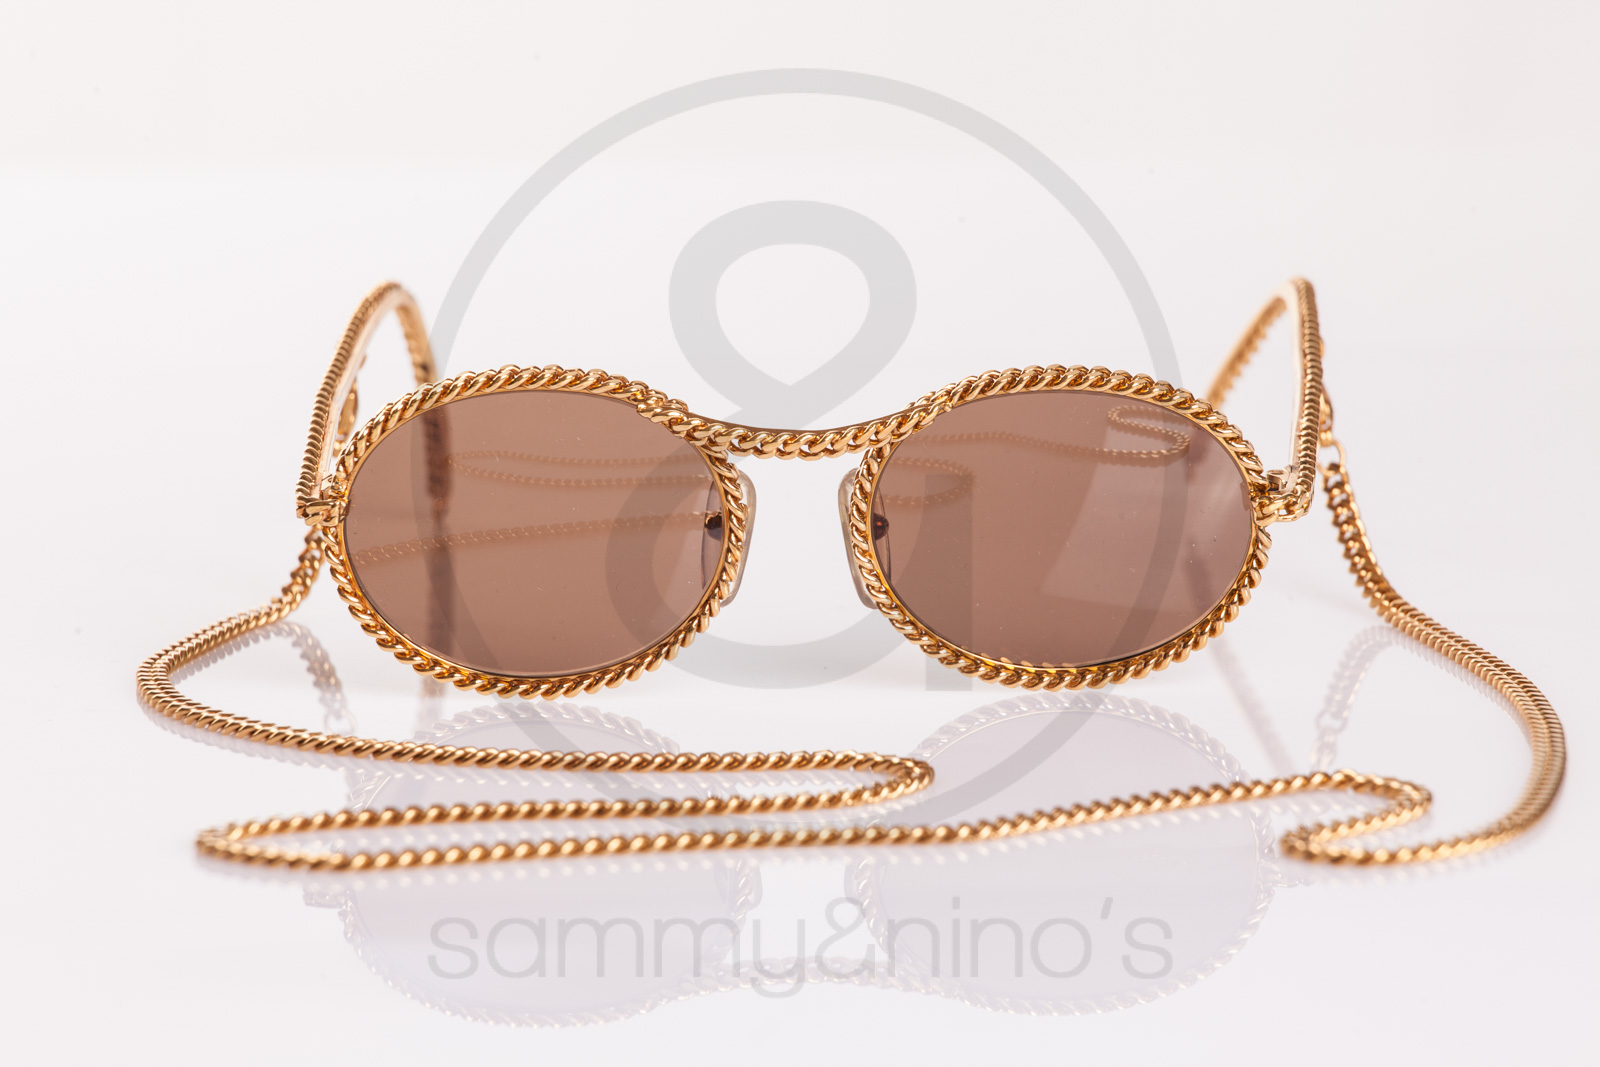 994ff56d631c Vintage Cartier Luggage.Cartier Bagatelle 55 18 - Sammy Nino s Store ...